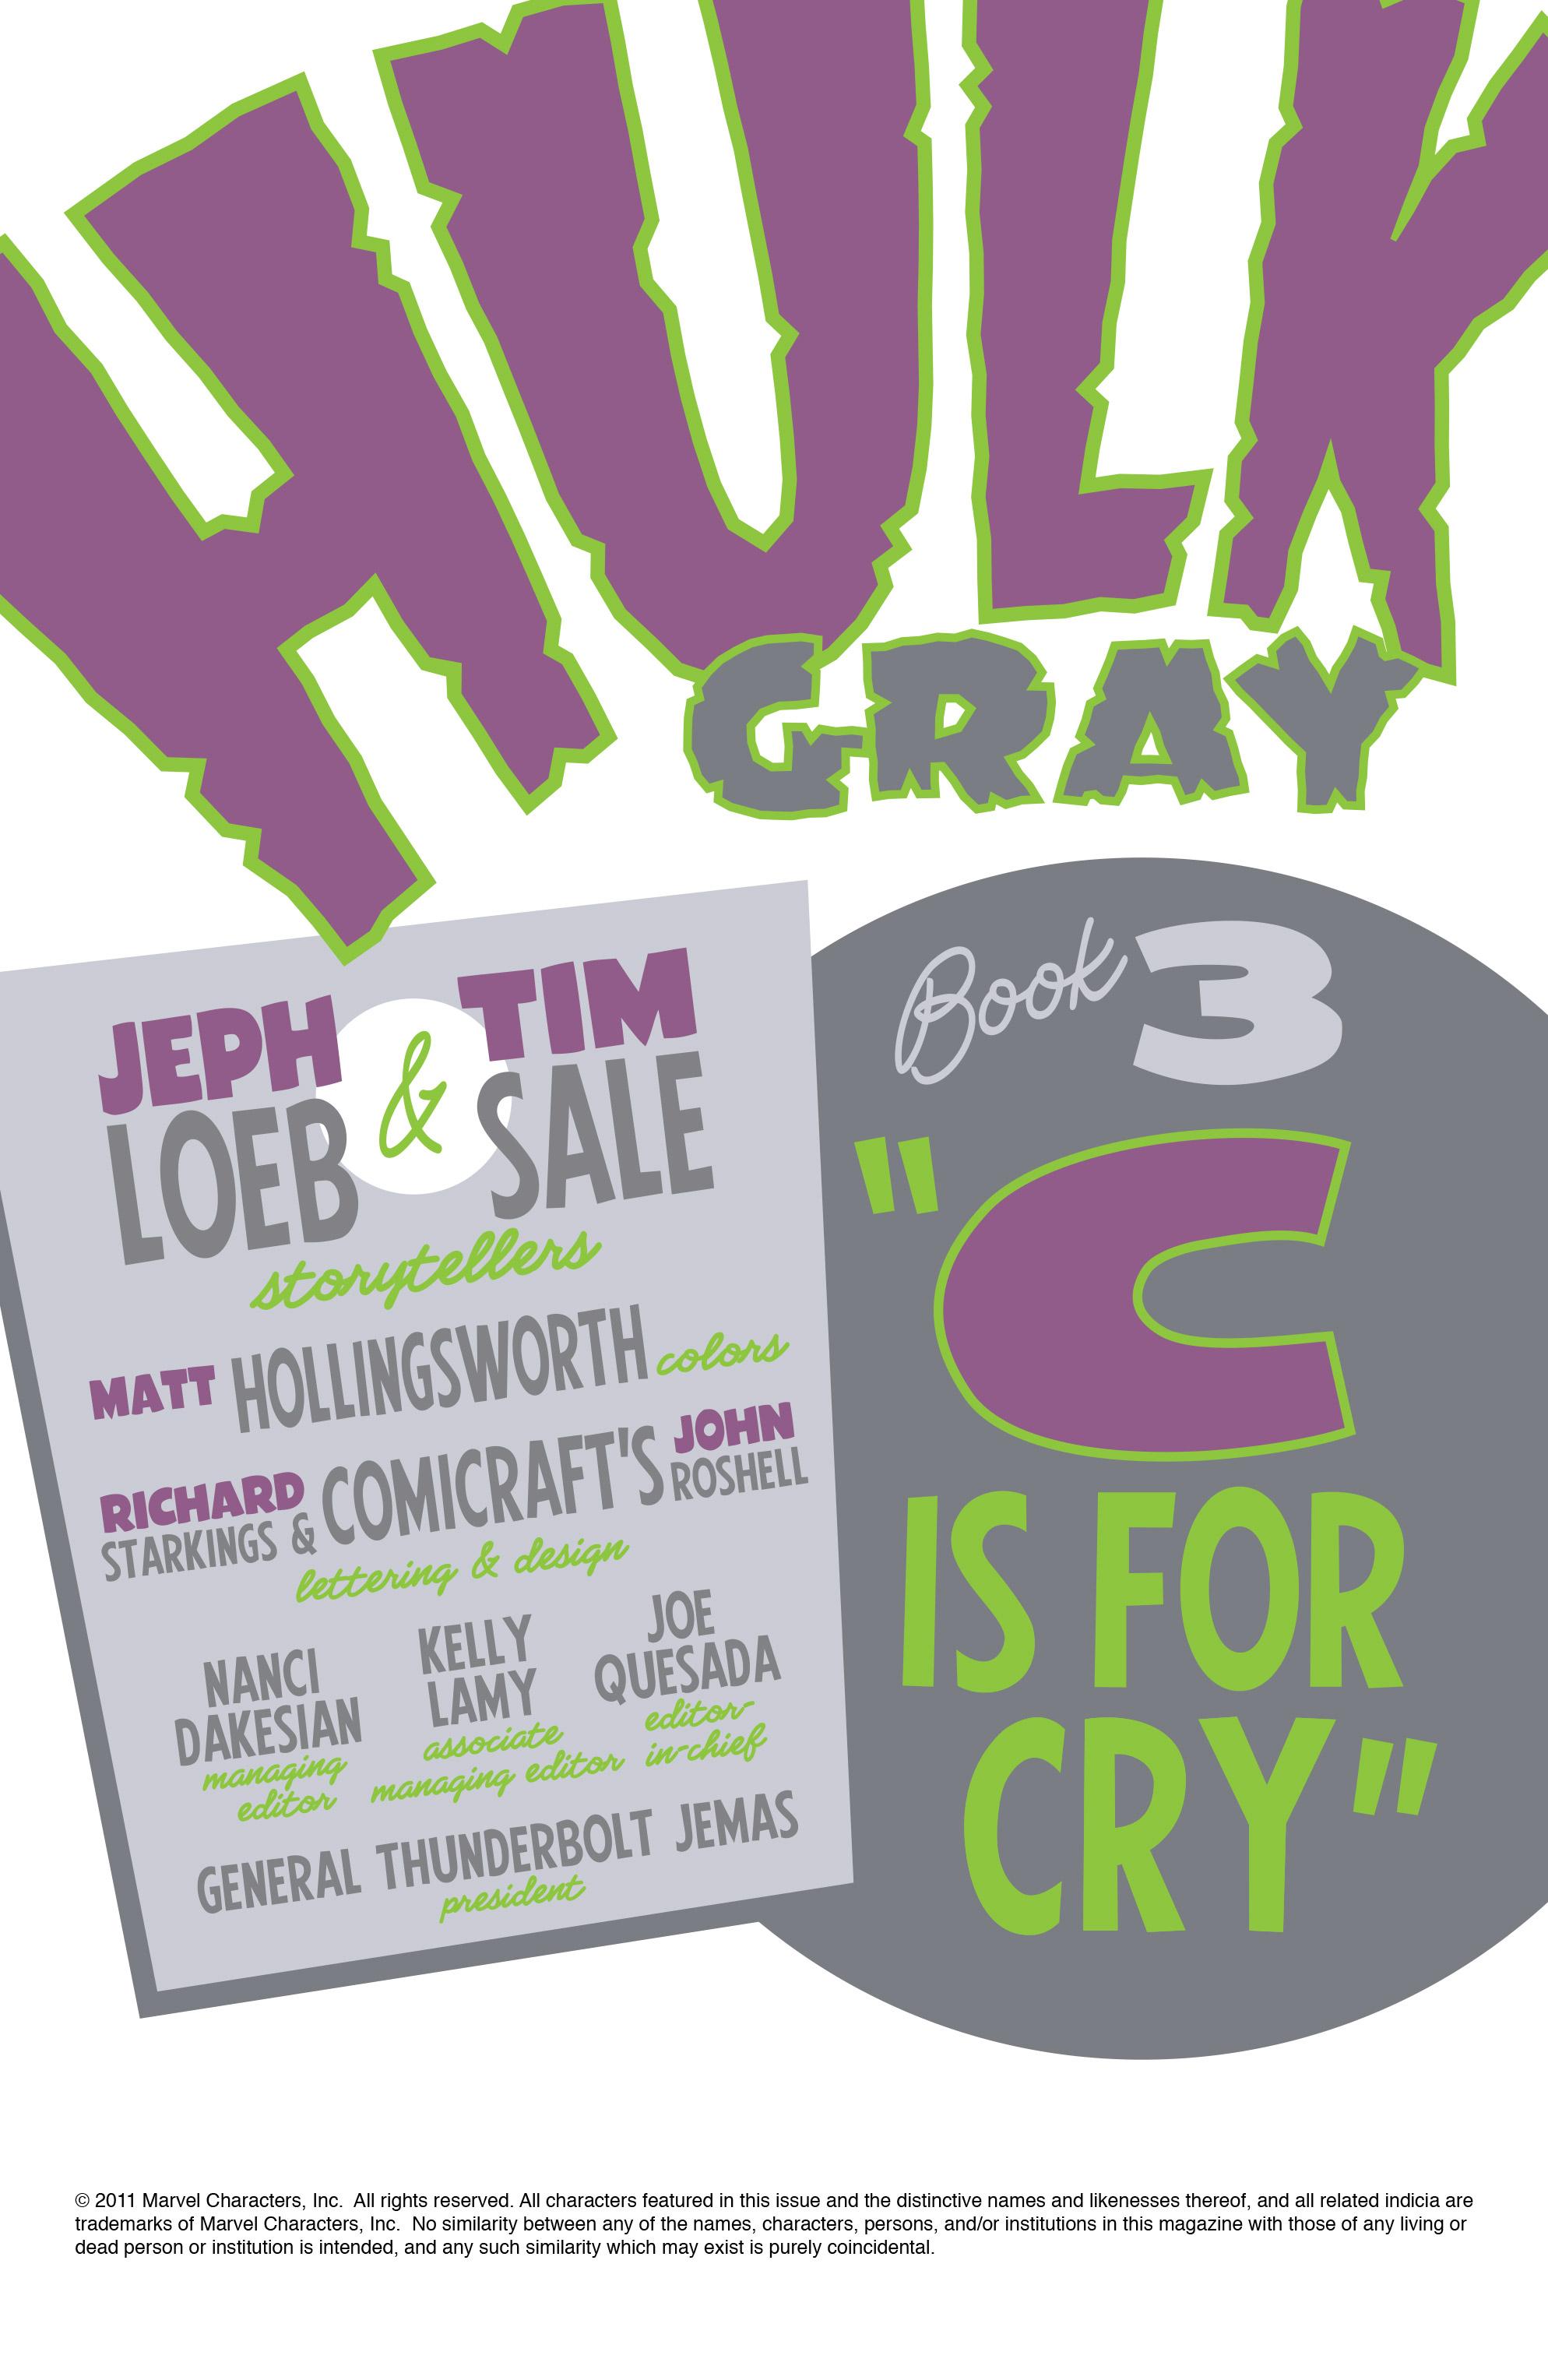 Read online Hulk: Gray comic -  Issue #3 - 2